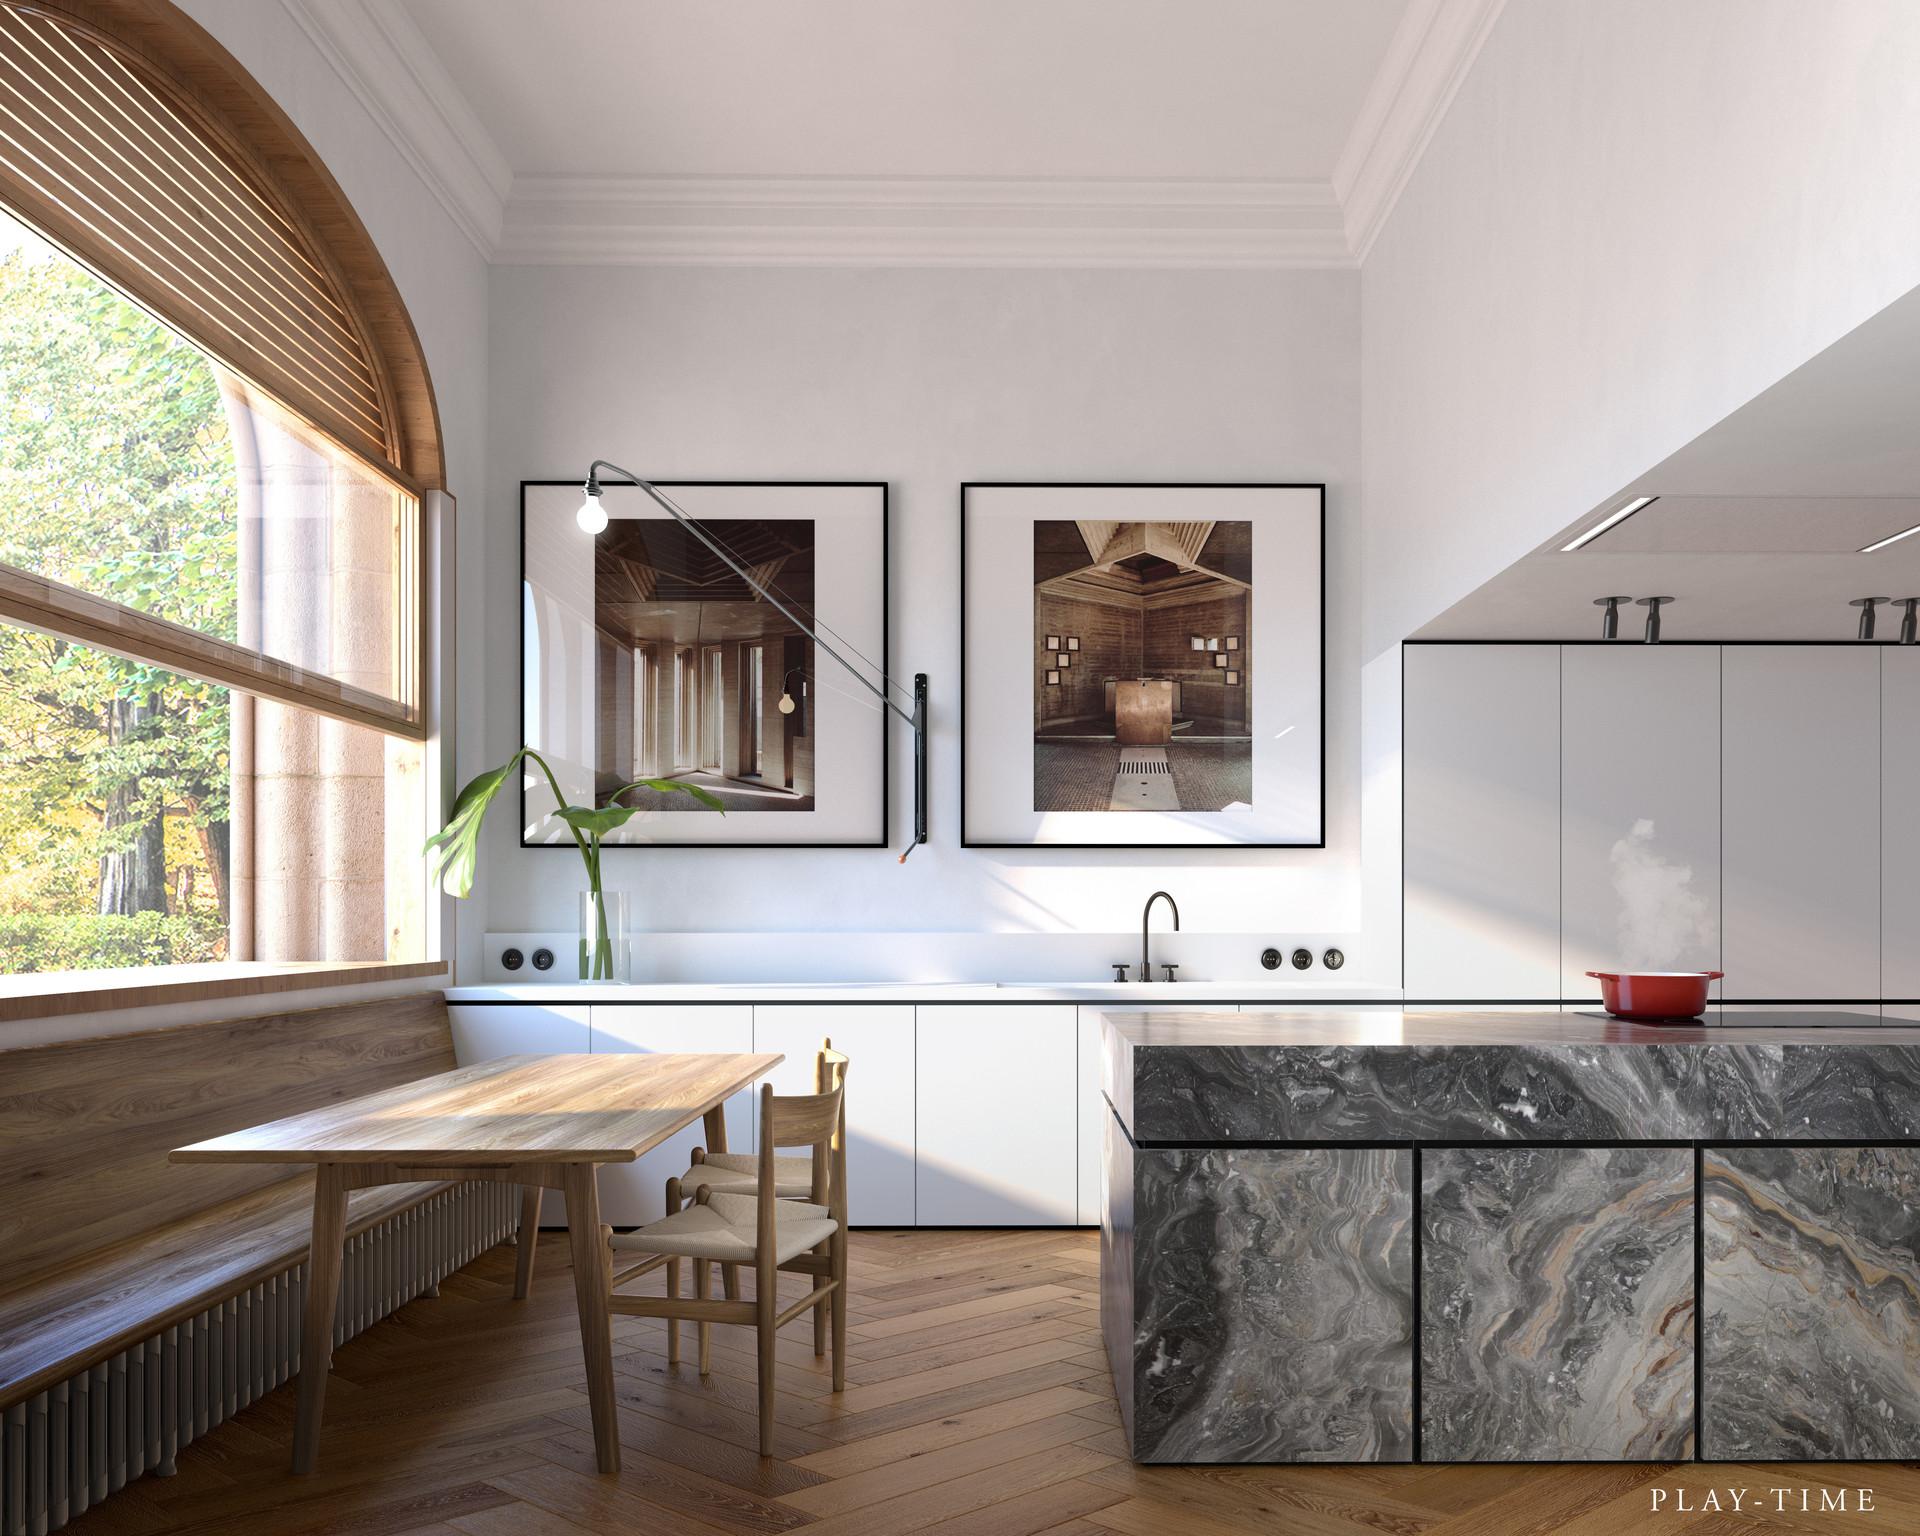 Play time architectonic image mesura house renovation alella 01